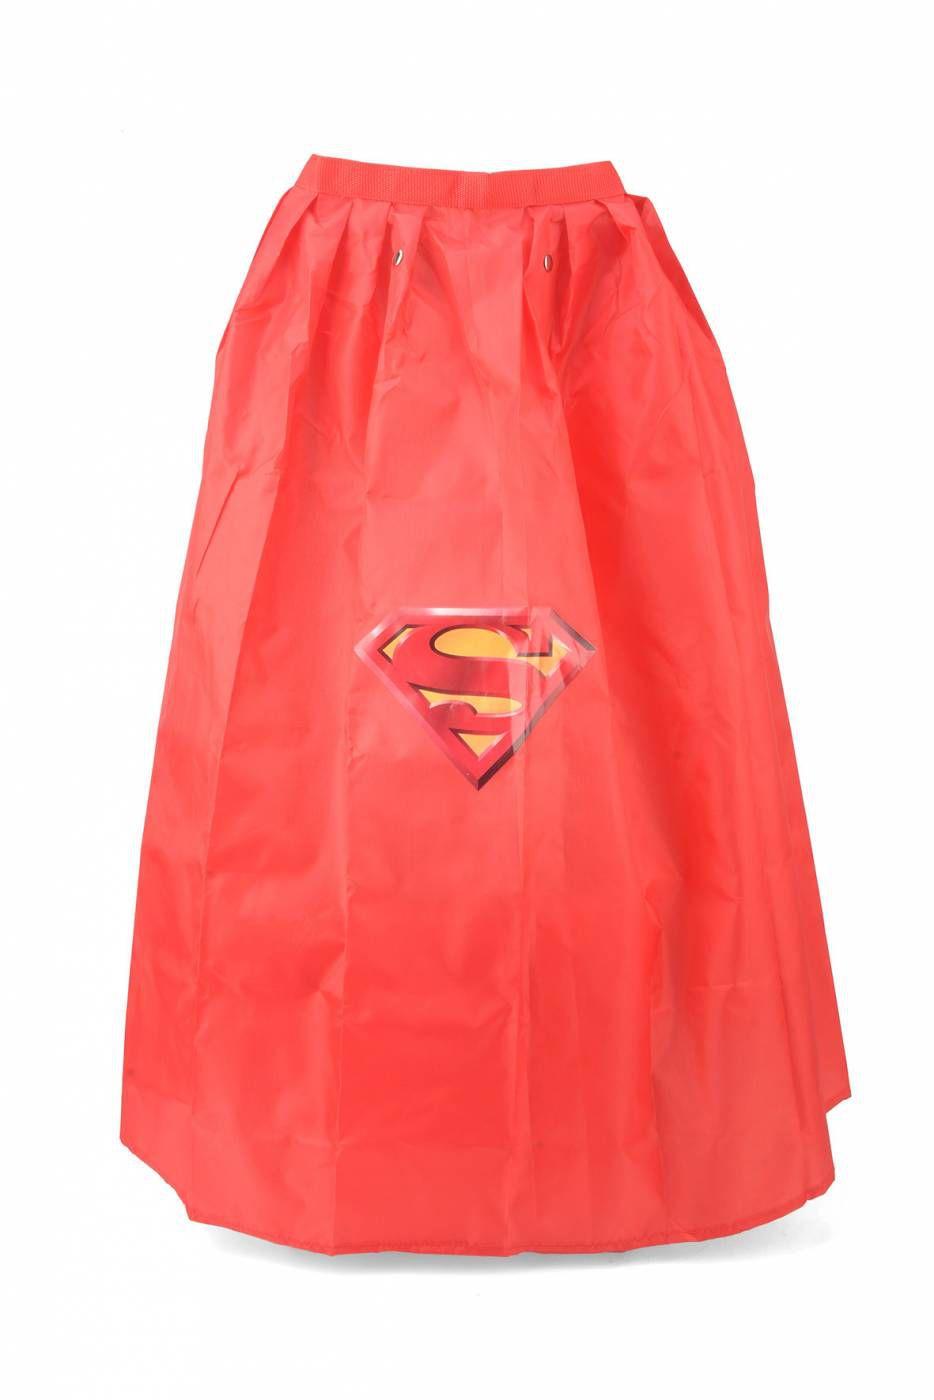 Mochila Luxcel Super Homem IS32911SM